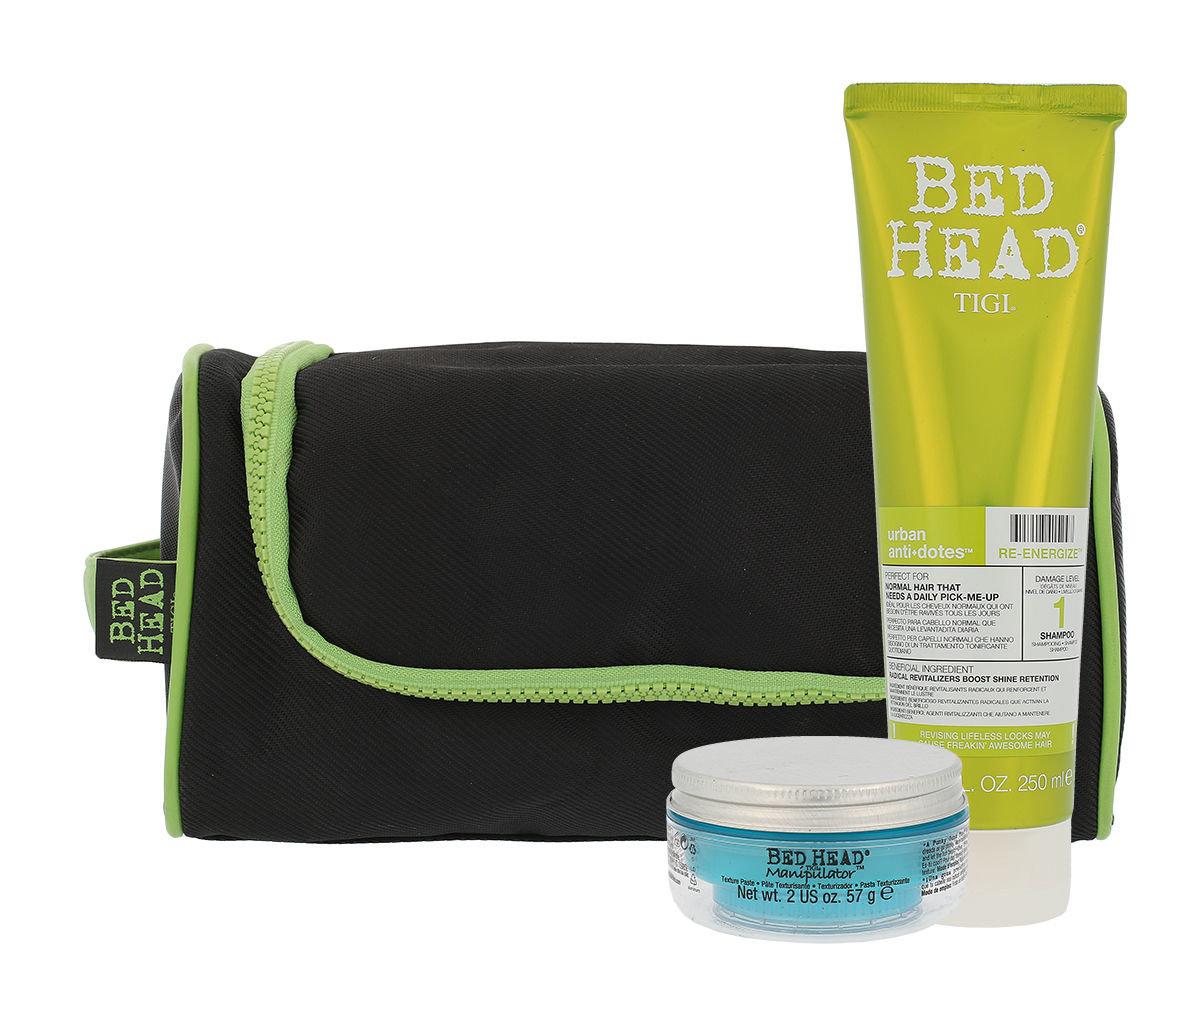 Tigi Bed Head Re-Energize Cosmetic 250ml